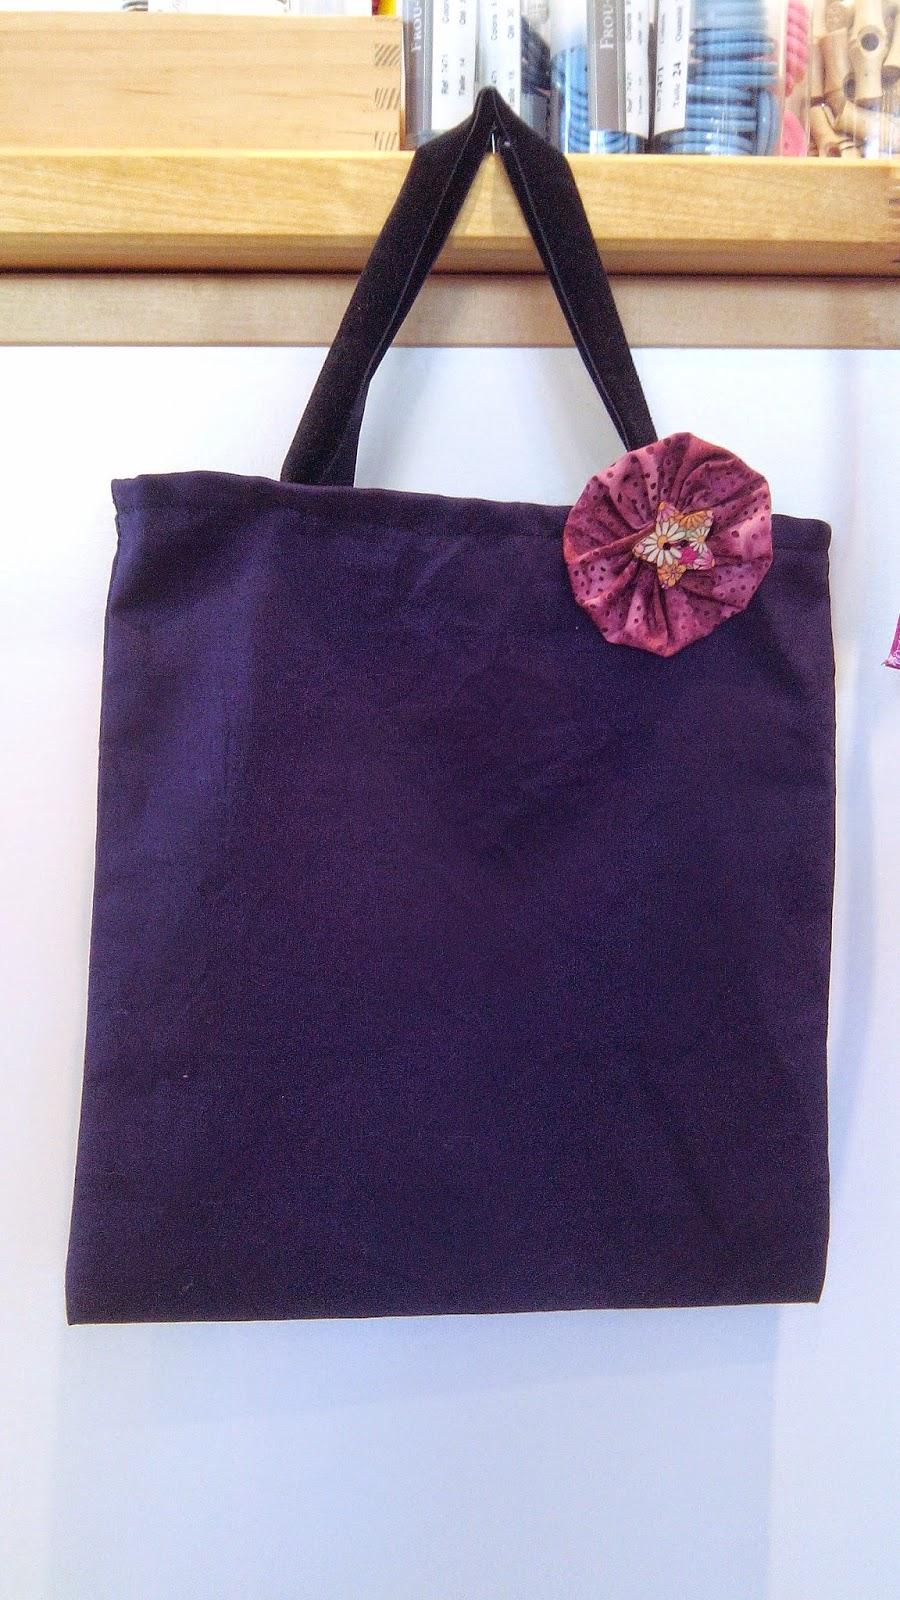 Couture en atelier tote bag bleu marine